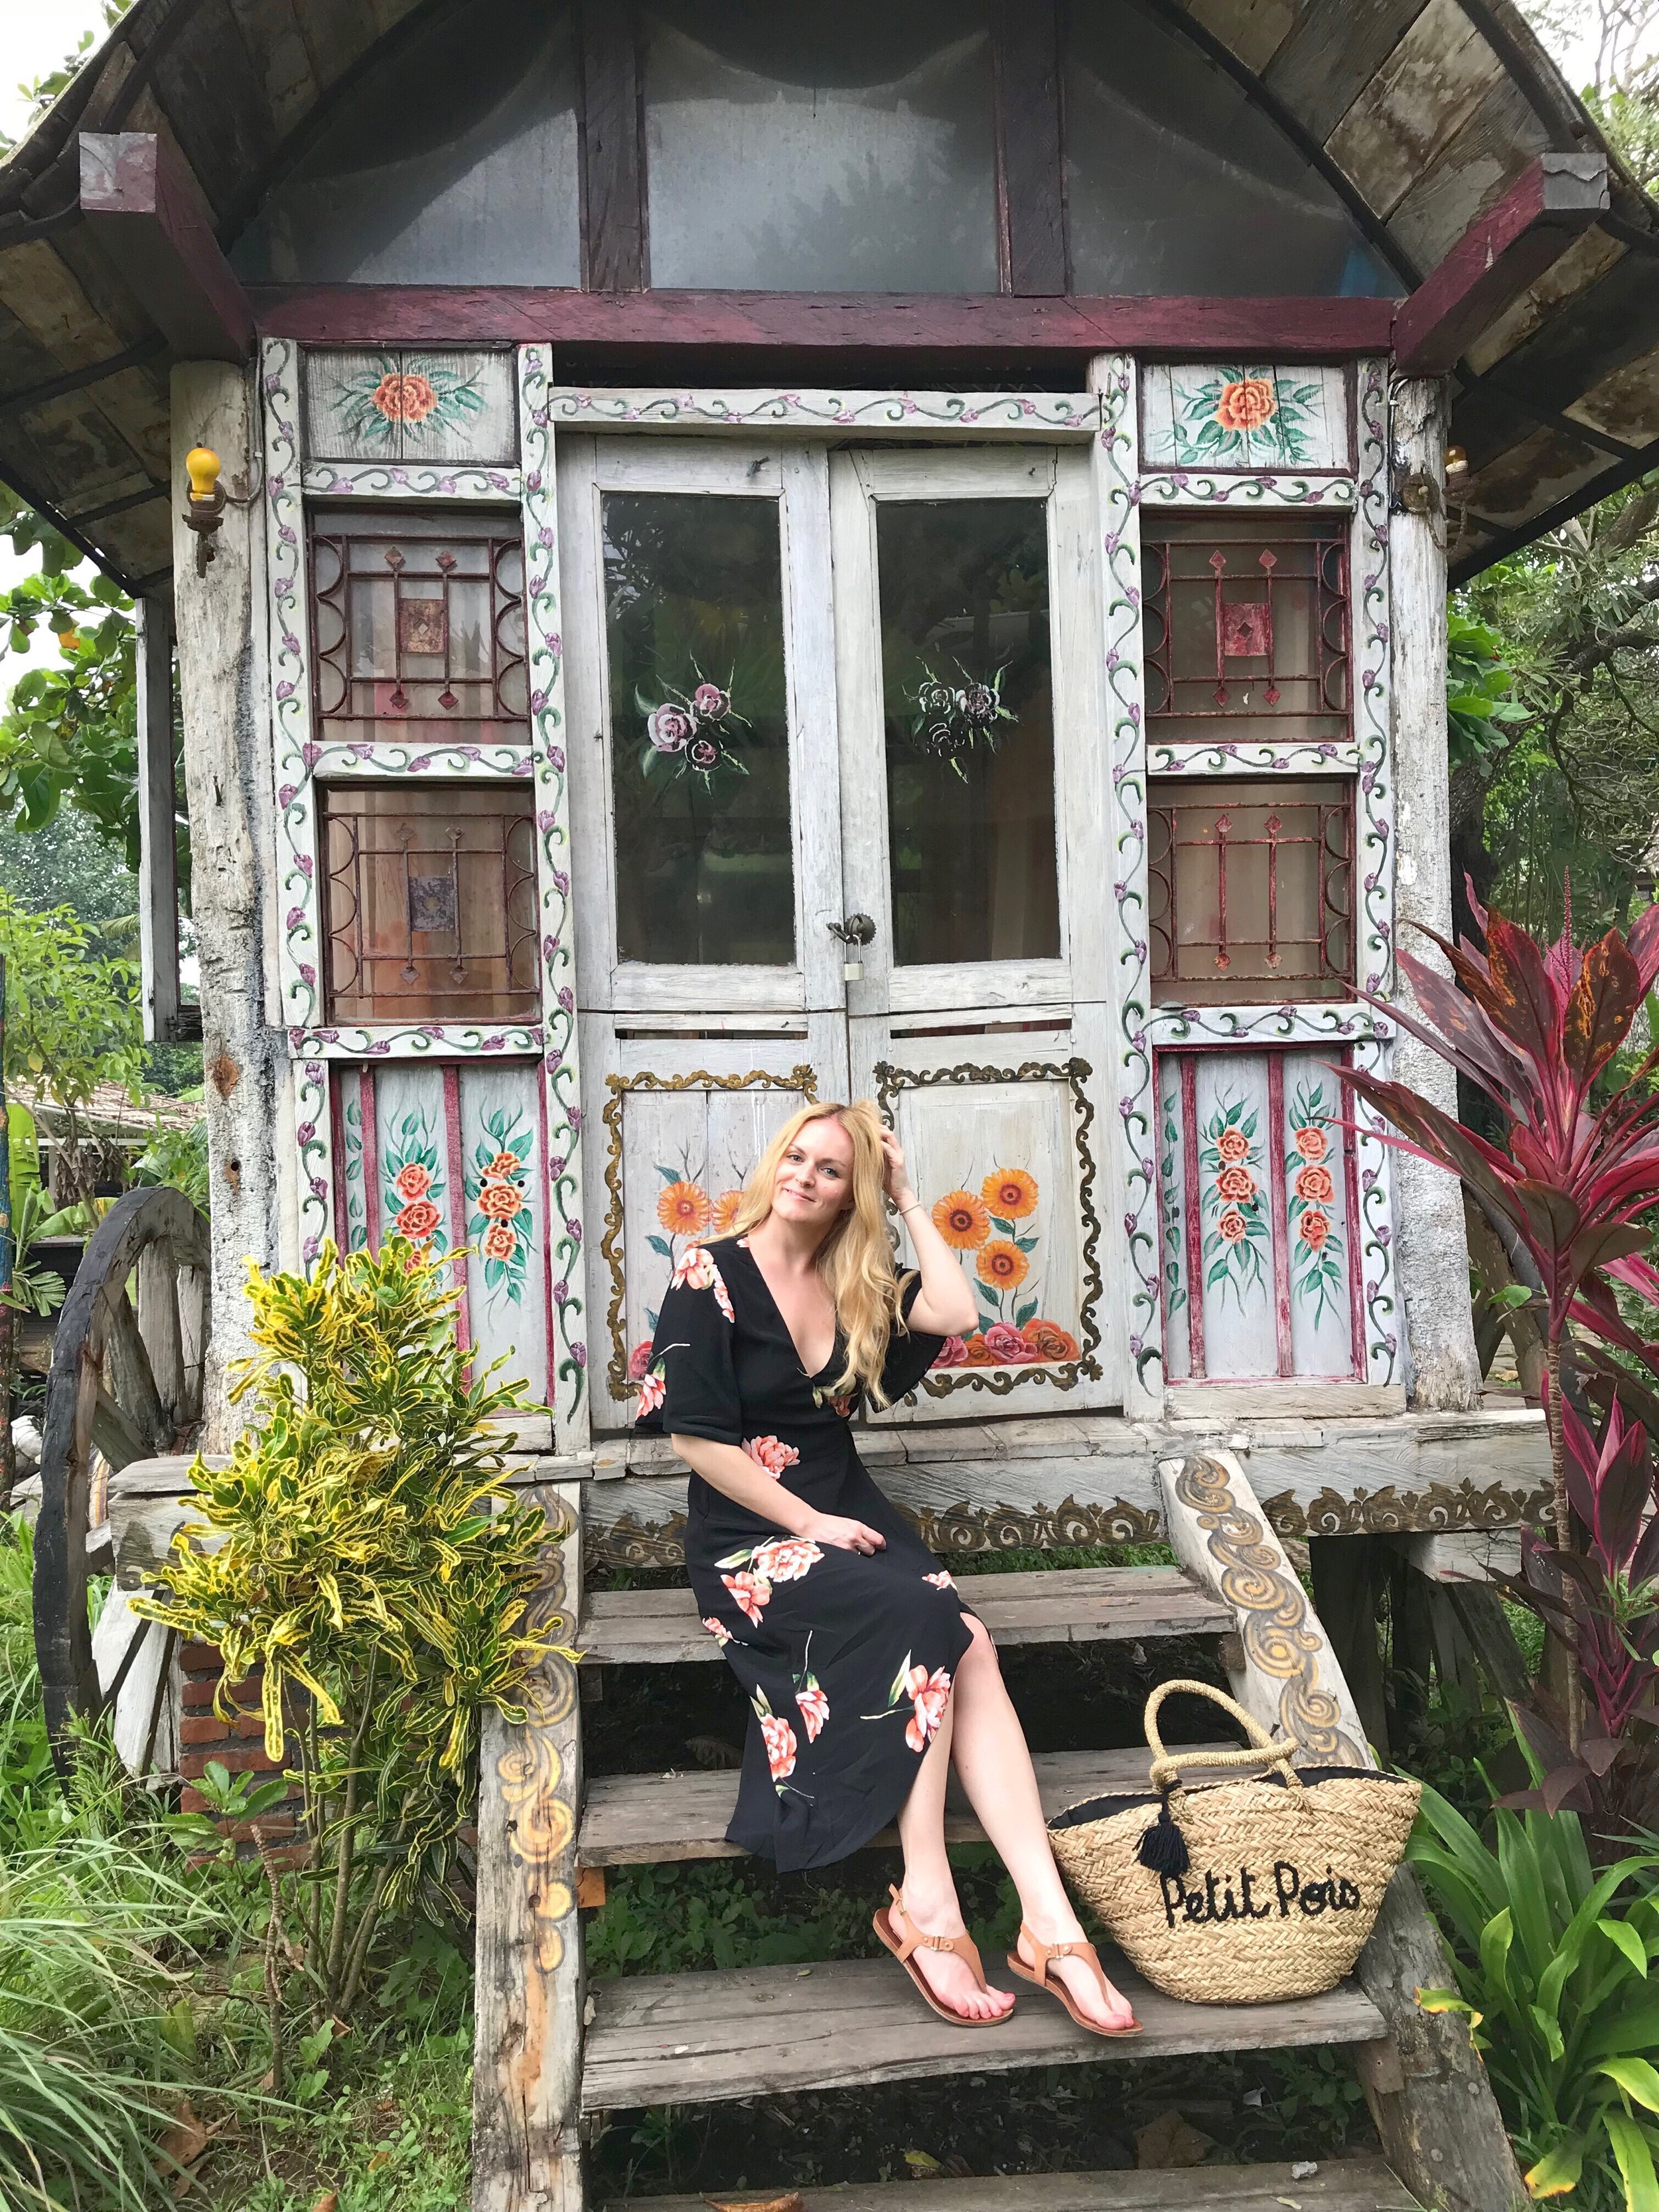 La Laguna, Bali Gypsy Caravan.jpg